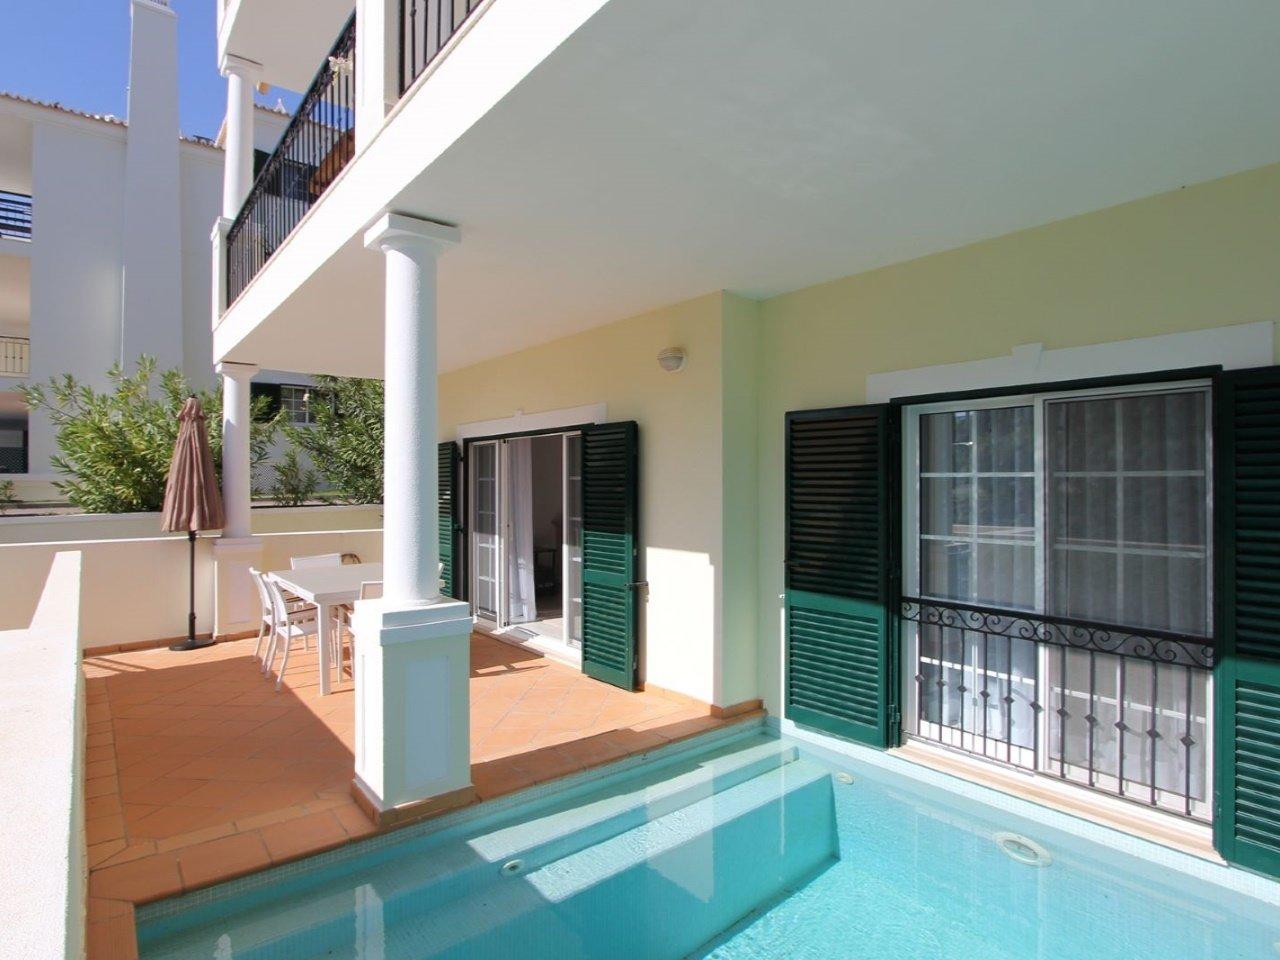 3 Bedroom Apartment Vale do Lobo, Central Algarve Ref: AAA56